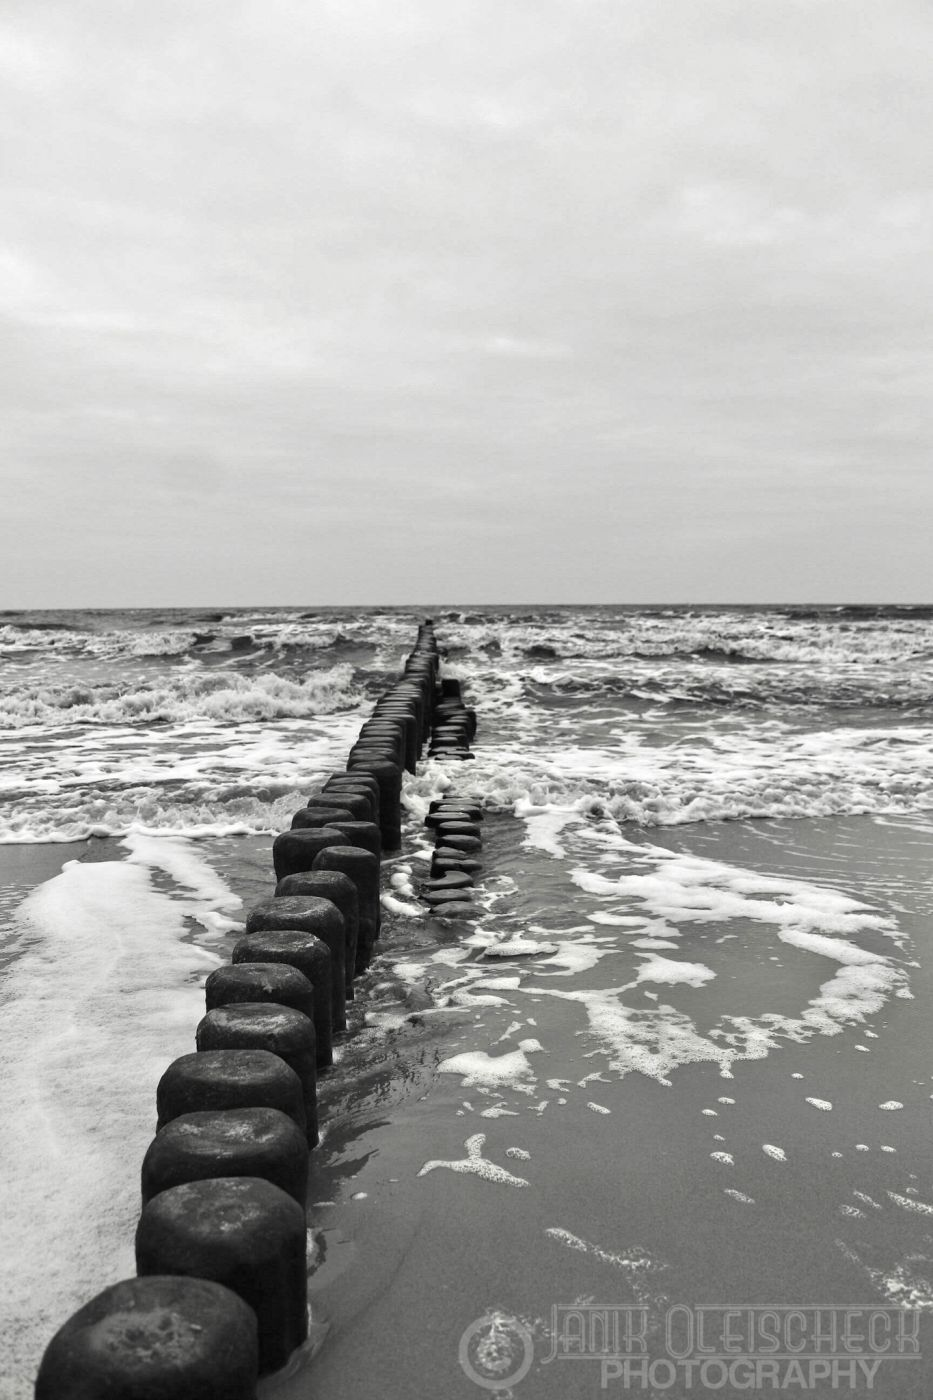 Groyne in the Baltic Sea, Germany